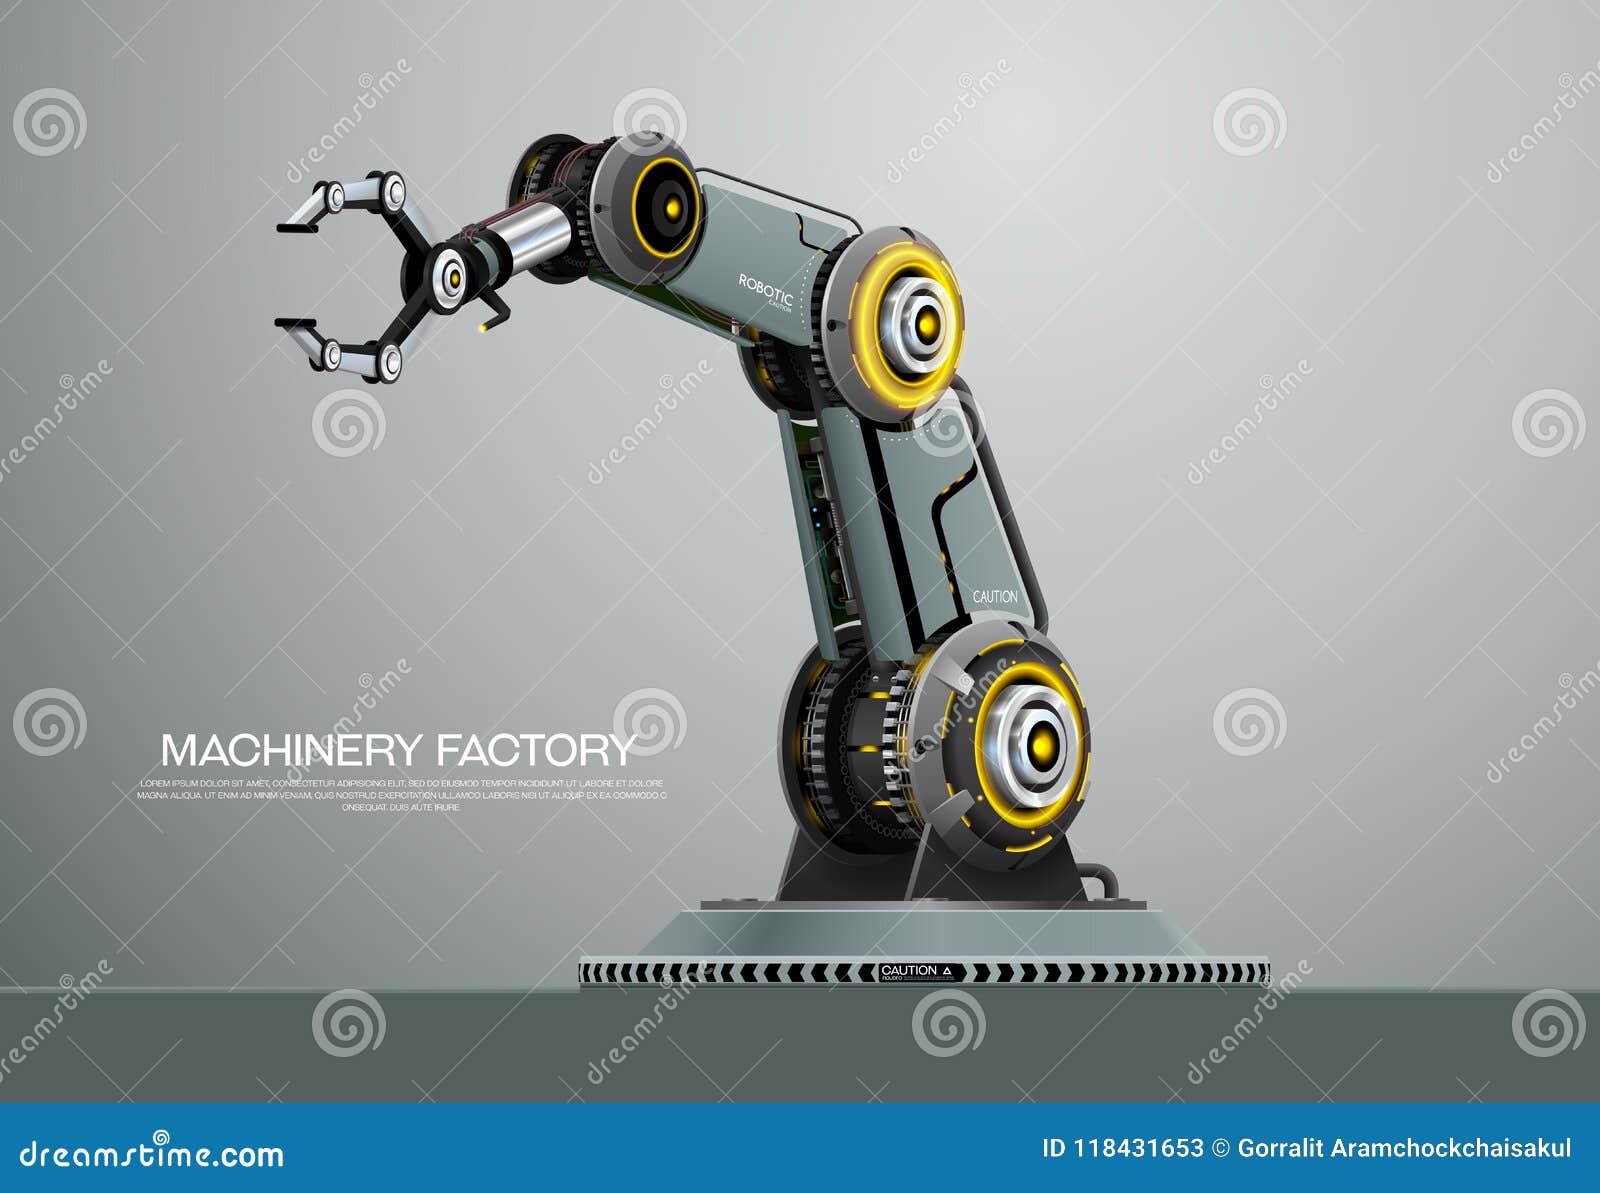 Machine Robotic Robot Arm Hand Factory Stock Vector - Illustration